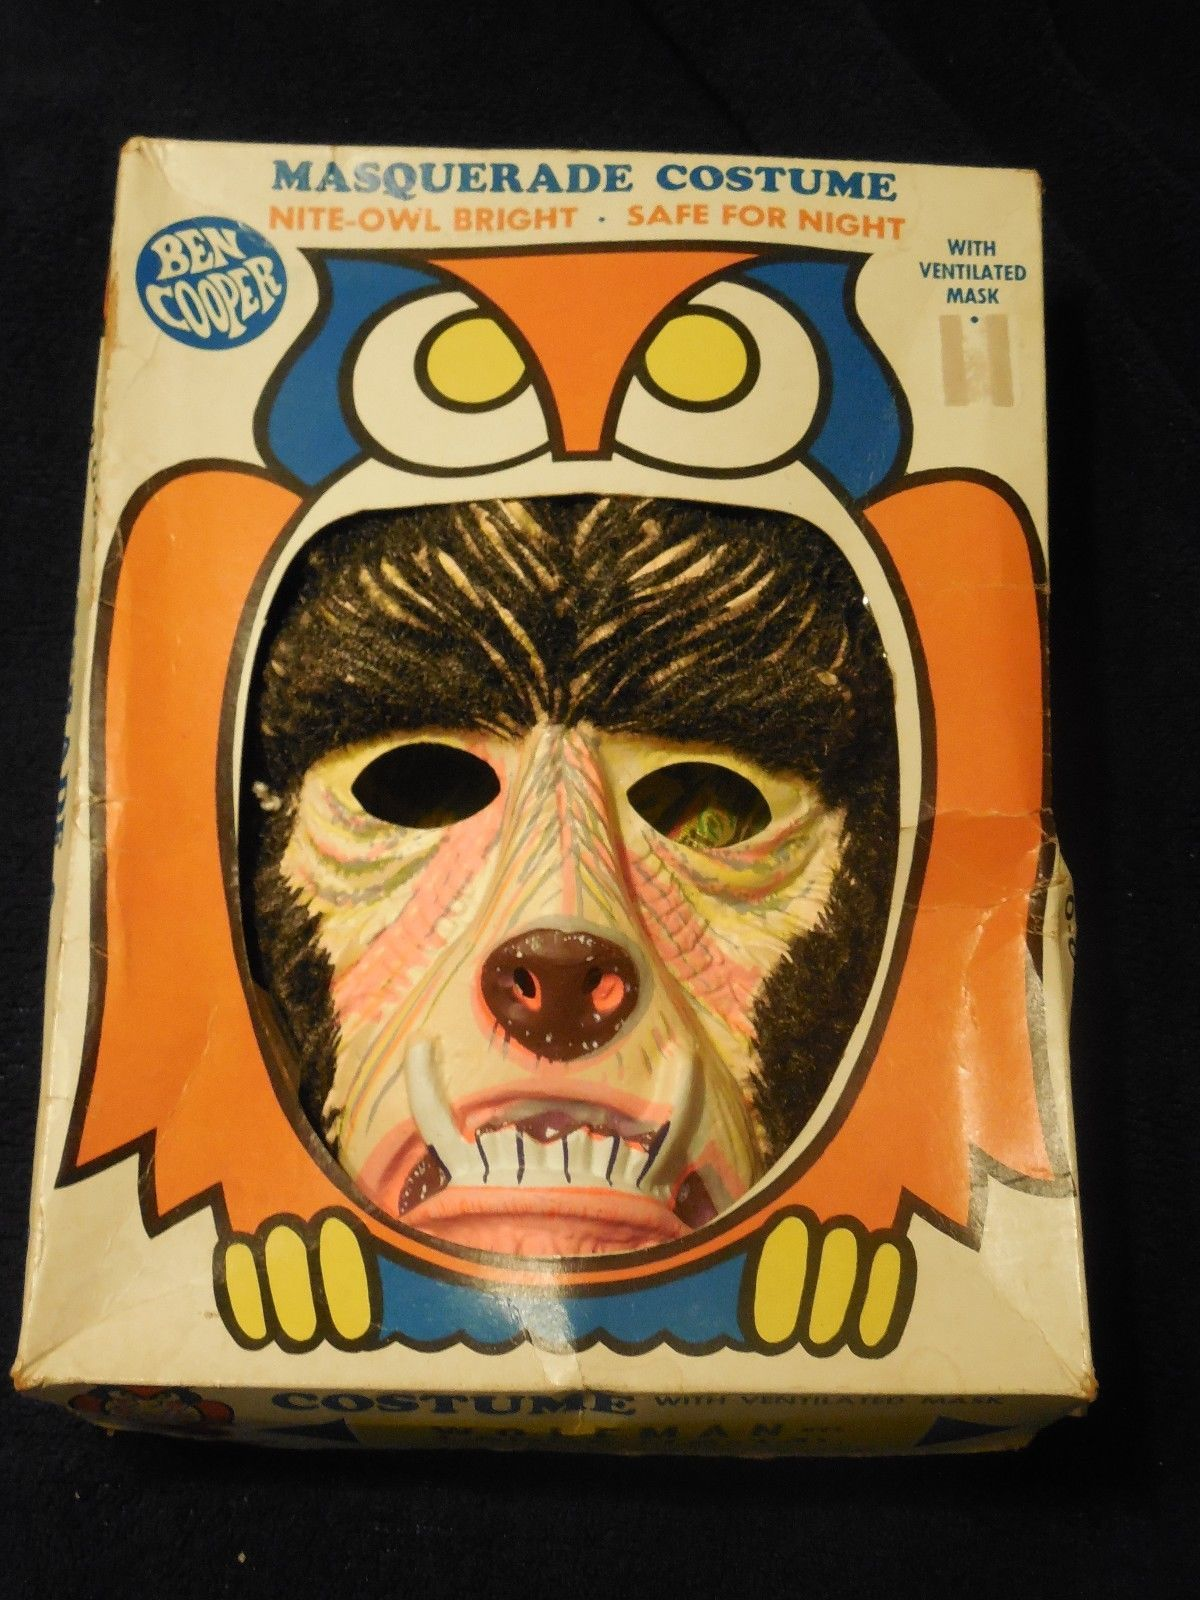 Ben Cooper Halloween Masks.Masks Accessories Vintage Ben Cooper Werewolf Halloween Mask